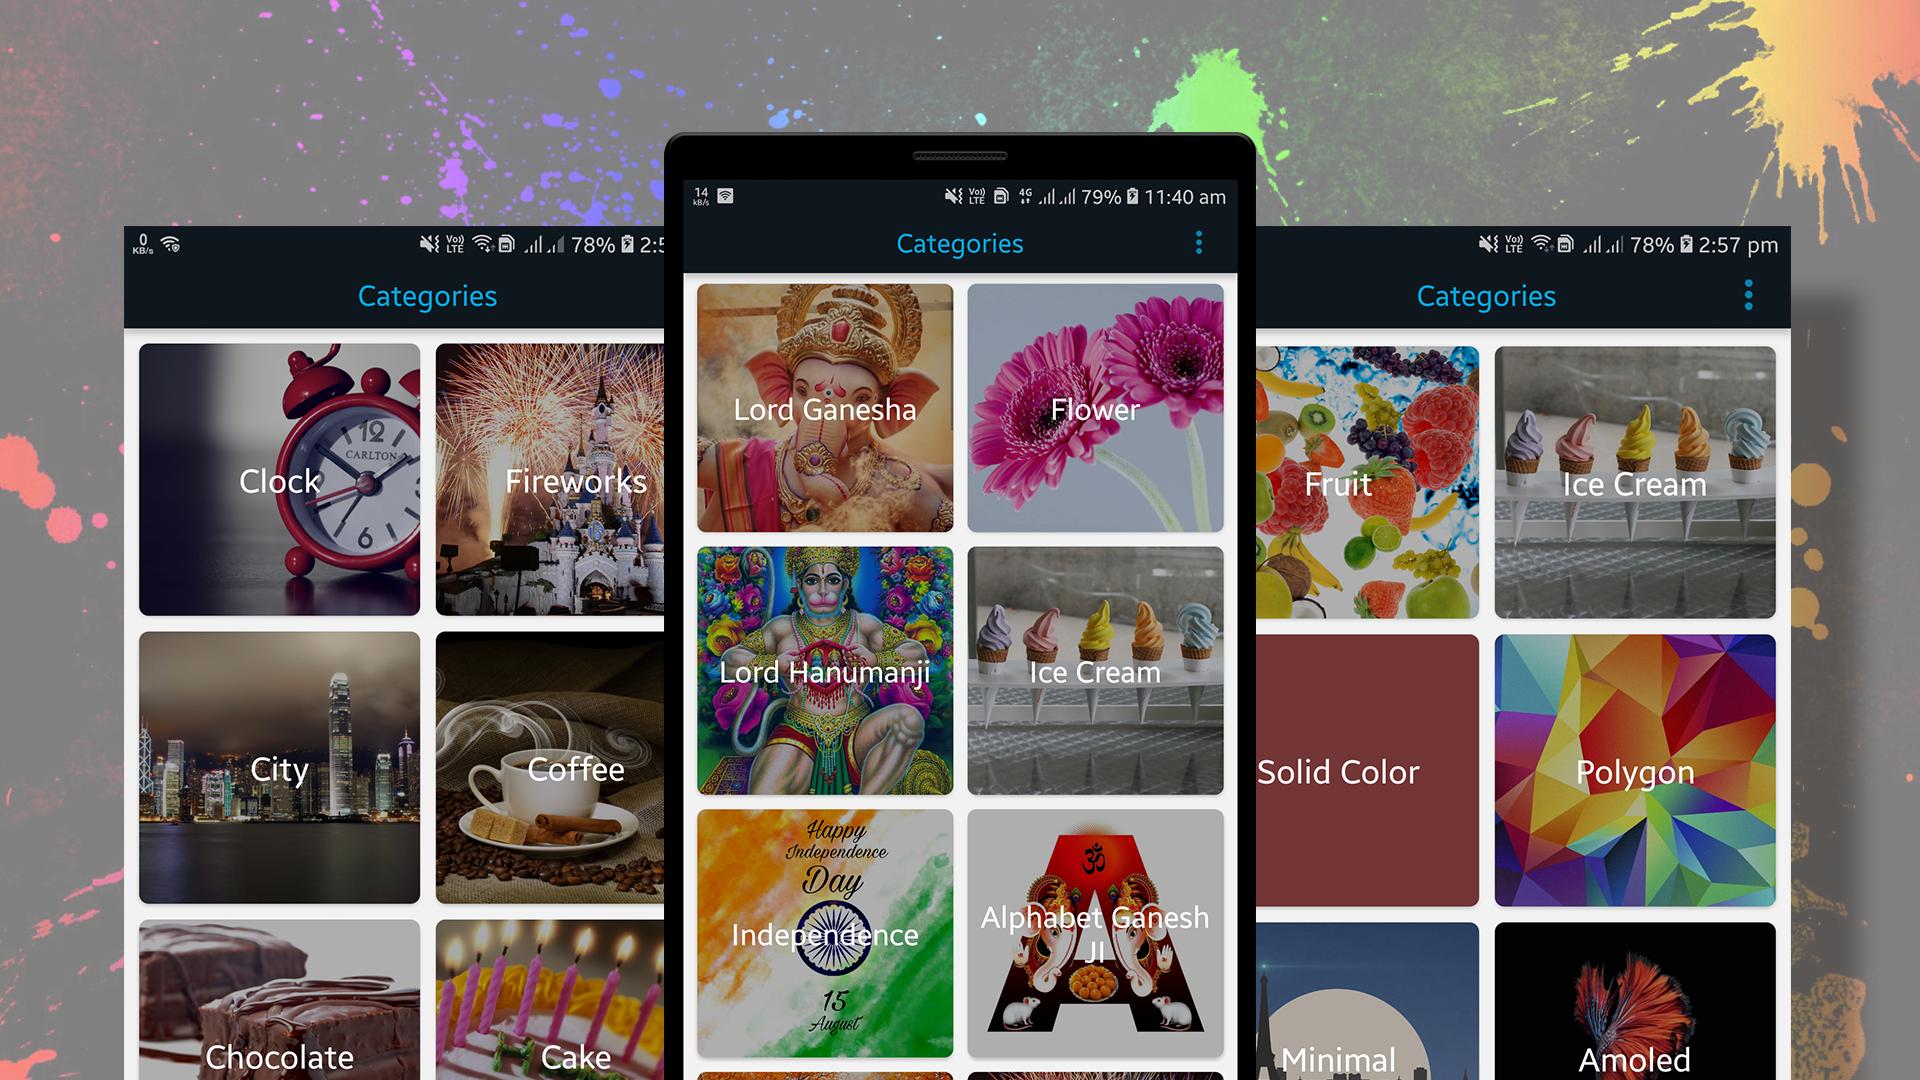 4k Hd Wallpapers Hd Background 2019 Amazones Appstore